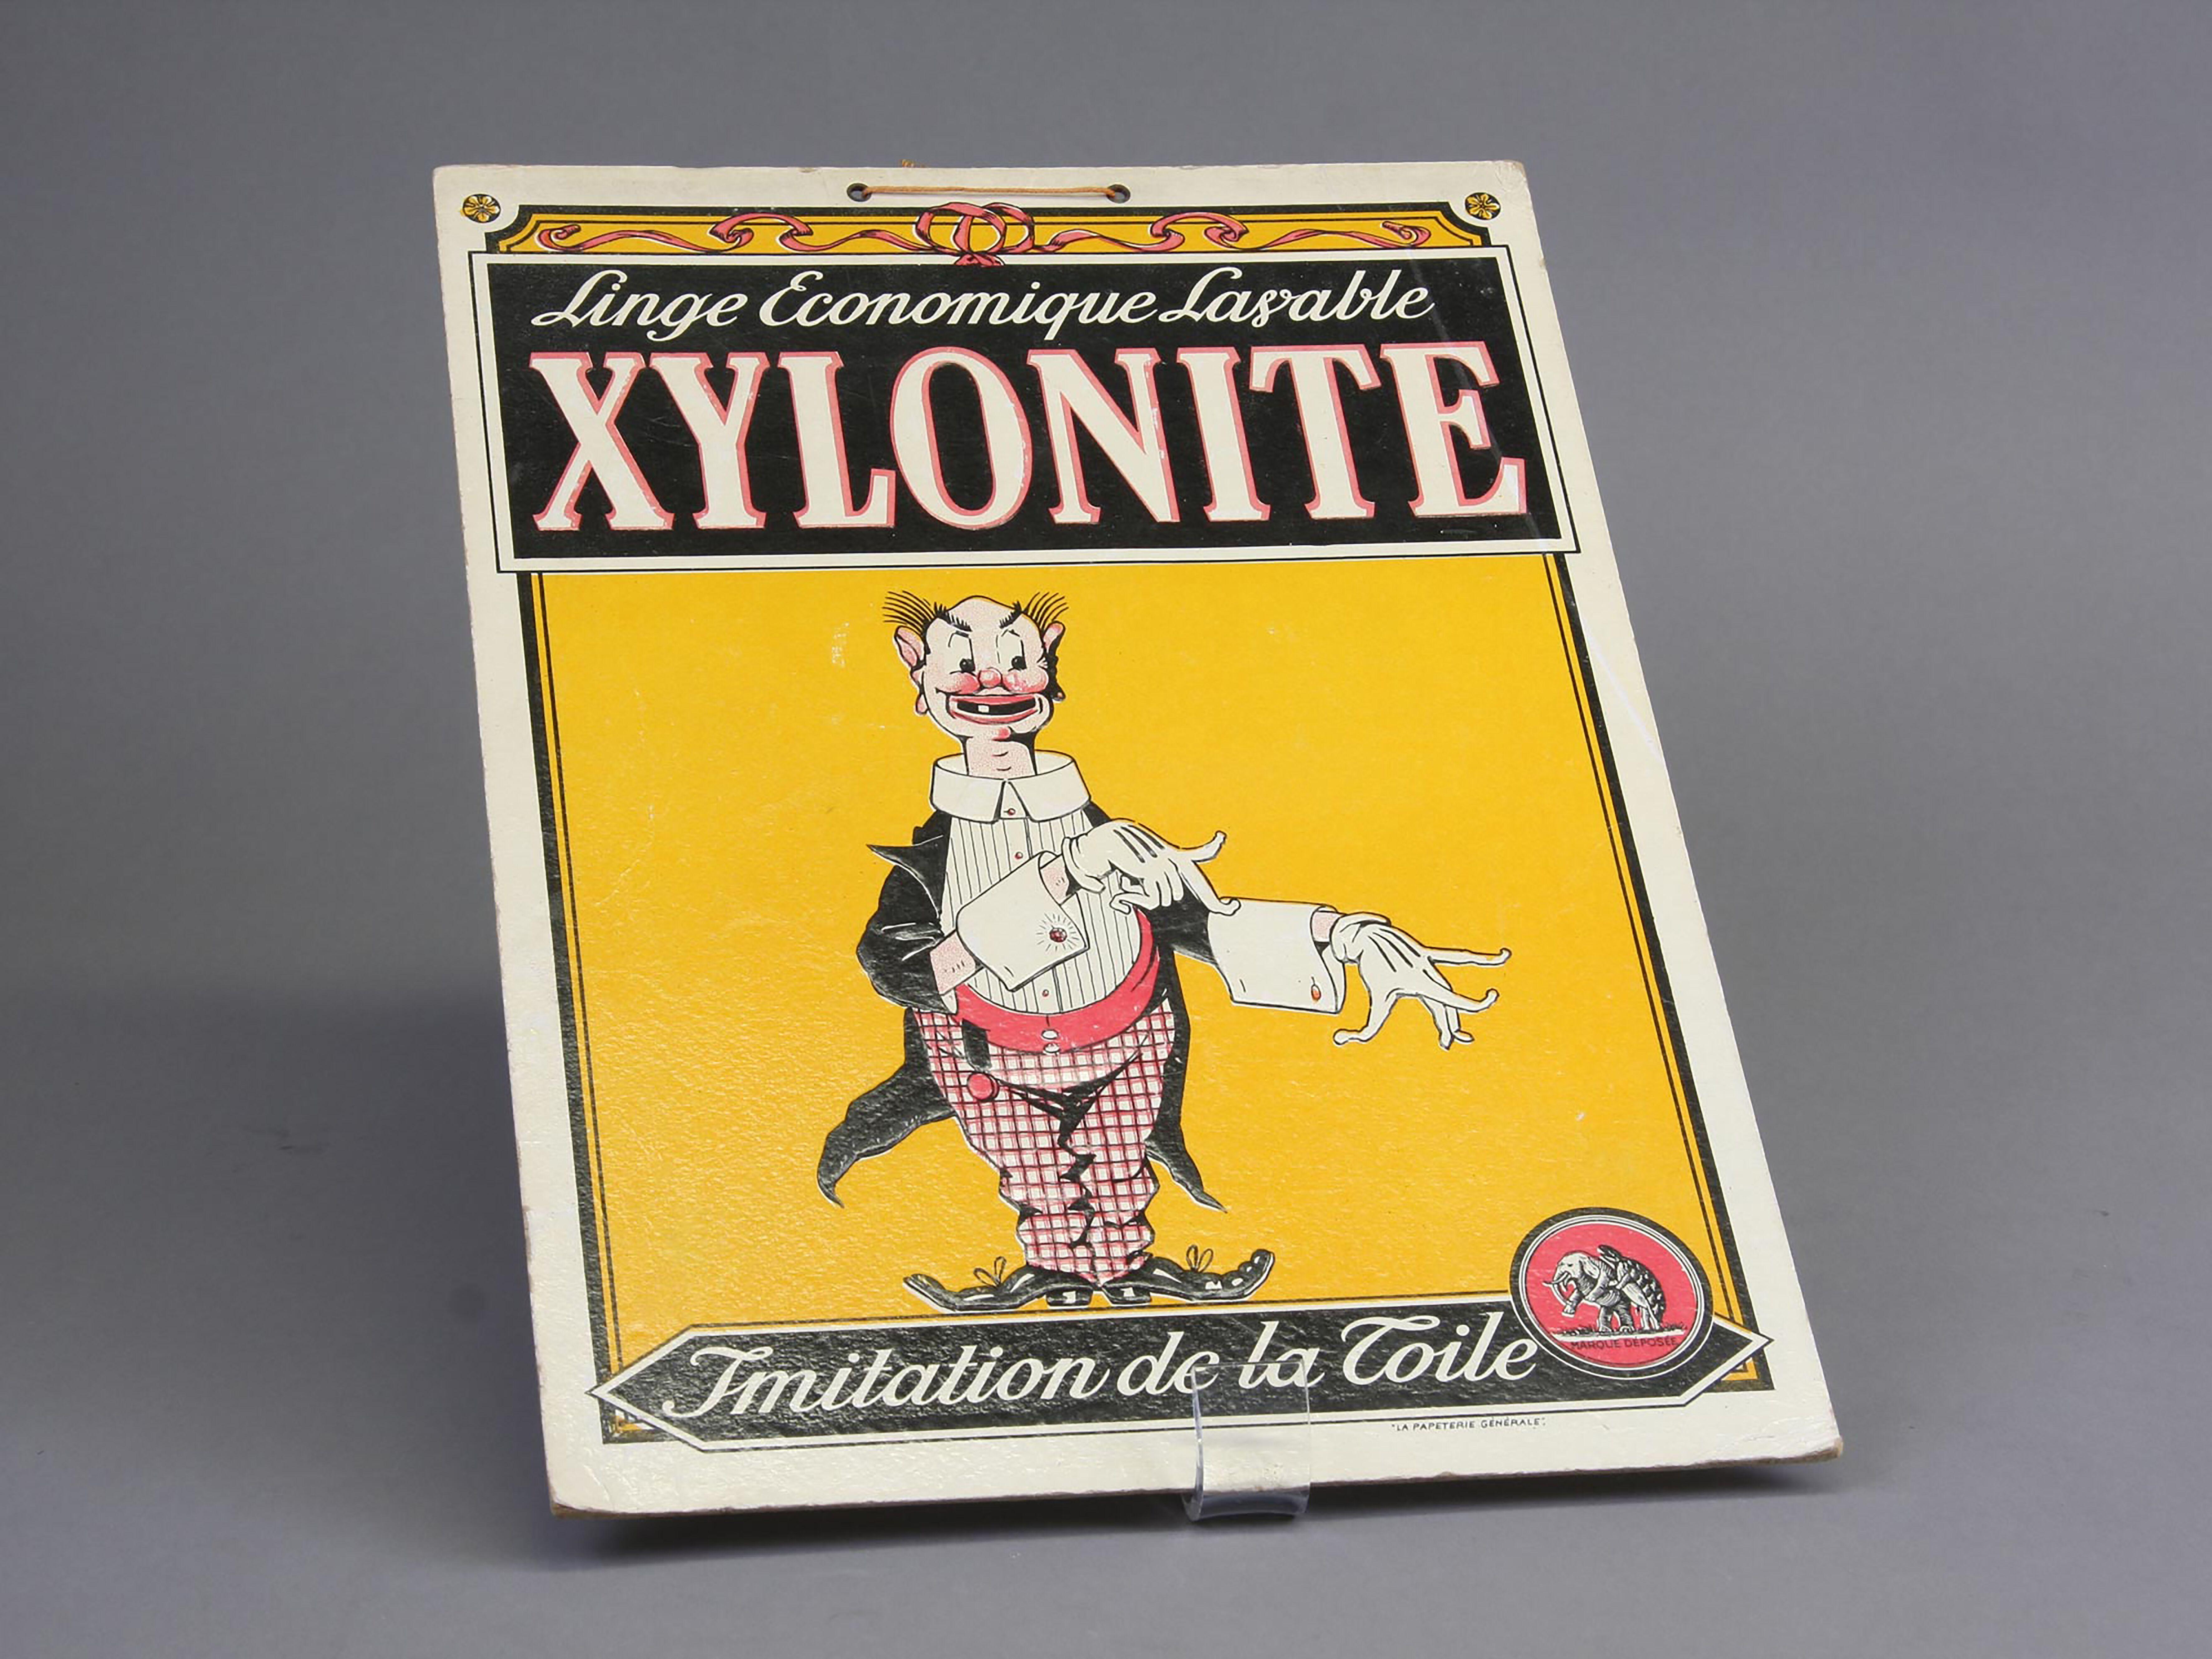 Xylonite Advert